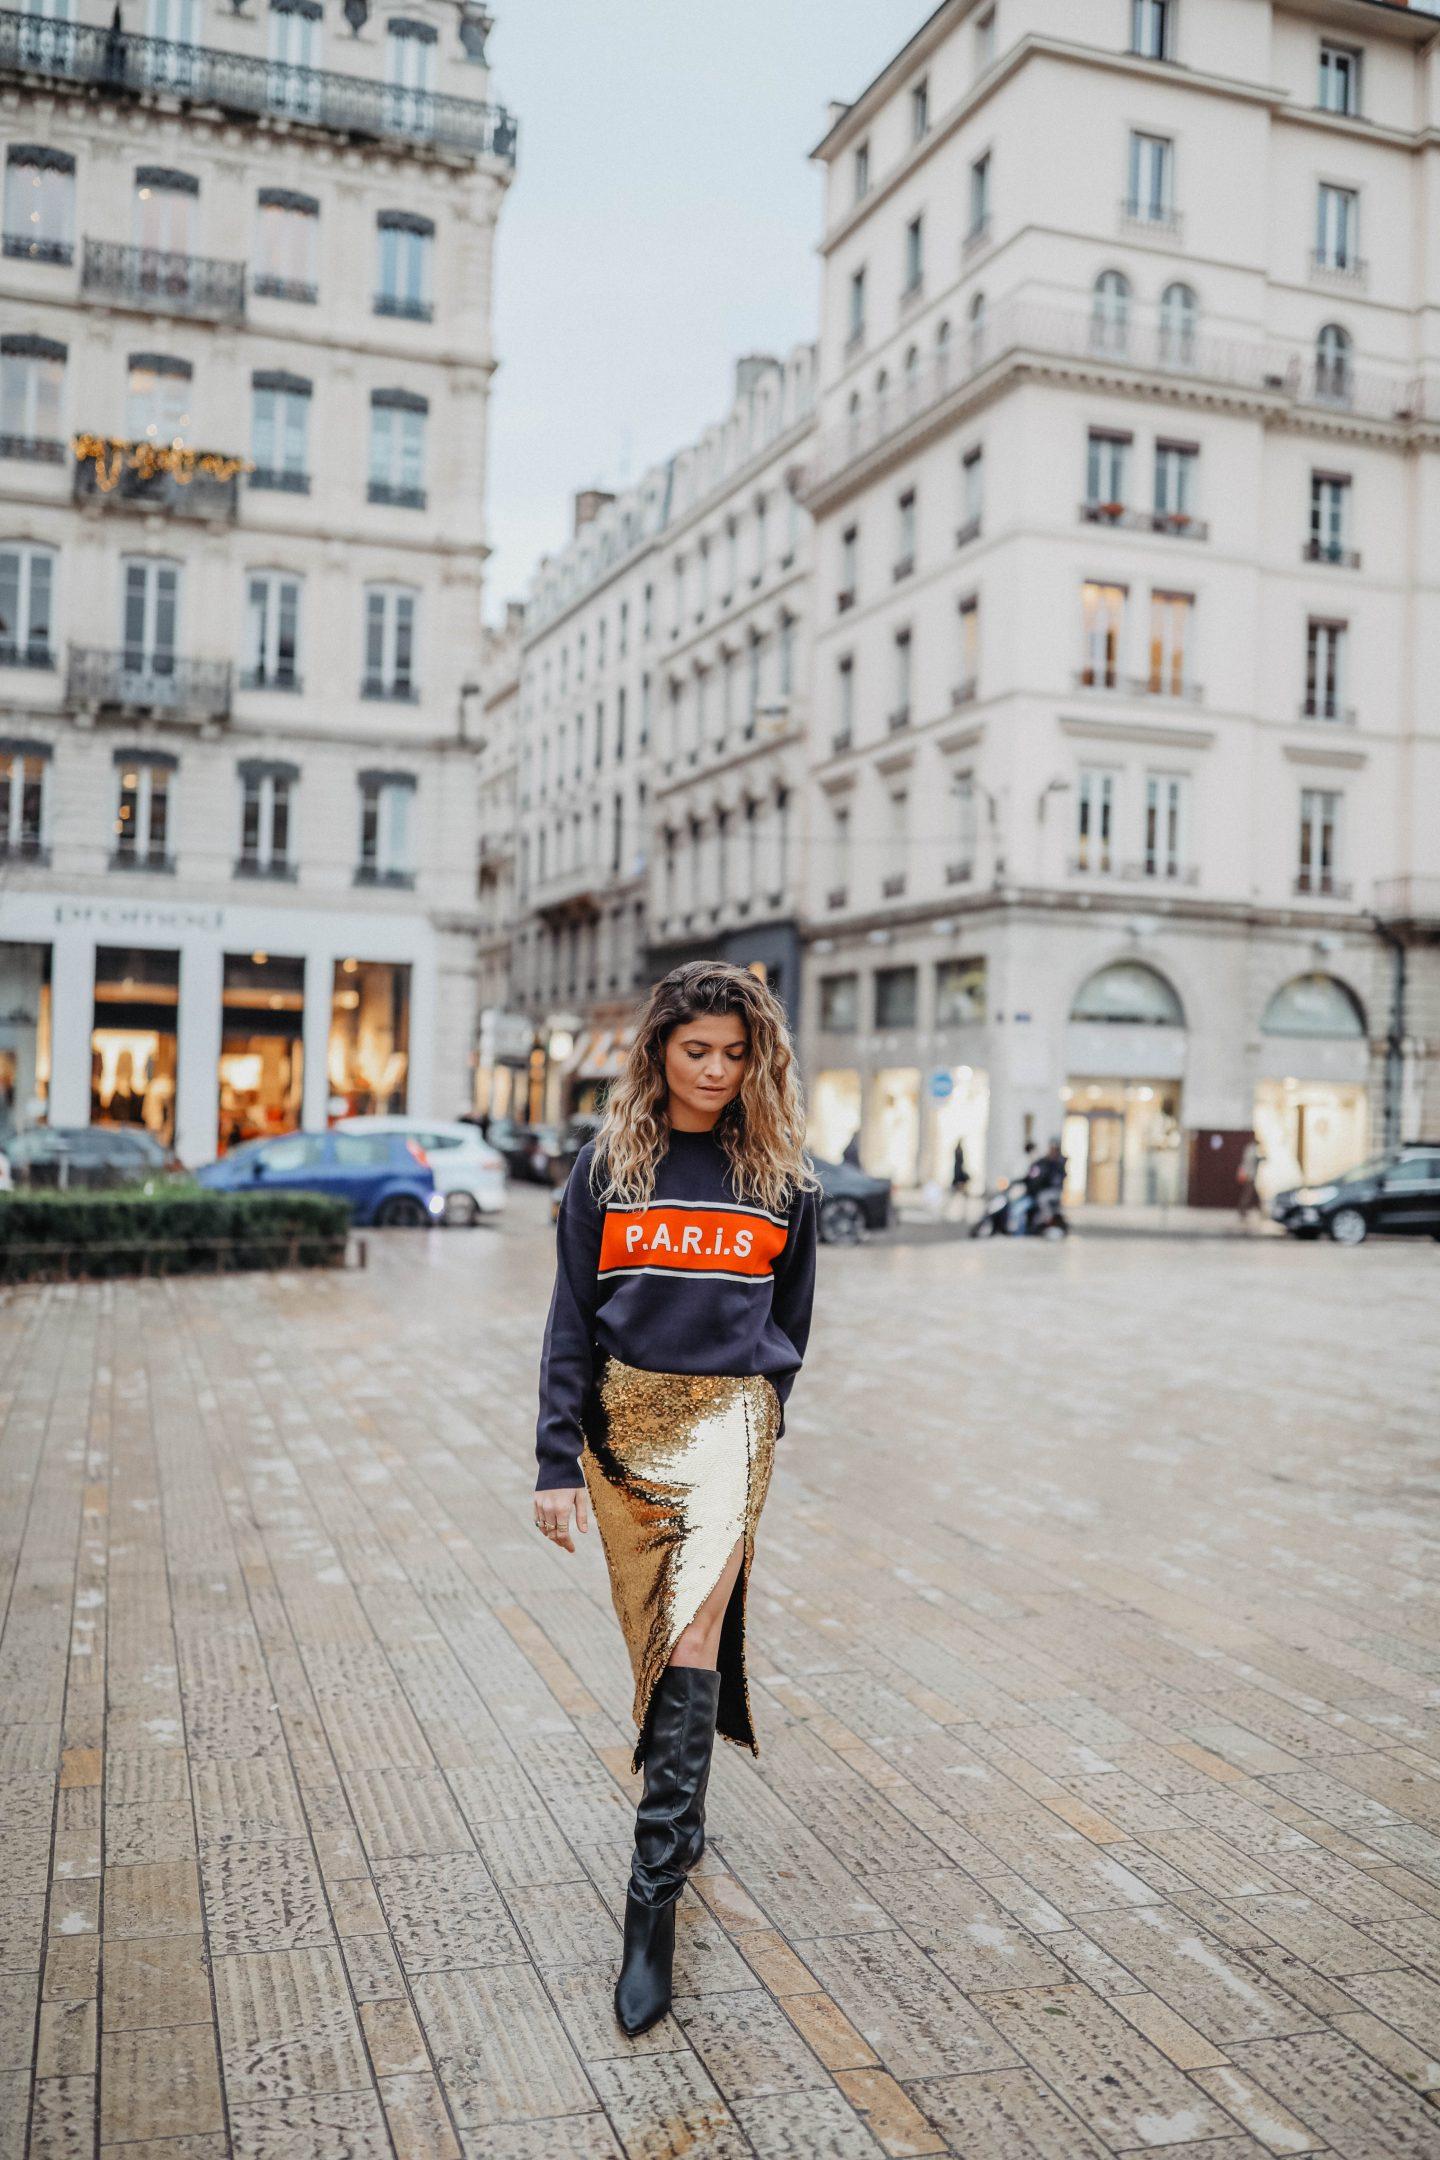 Idée de tenue femme marie and mood blog